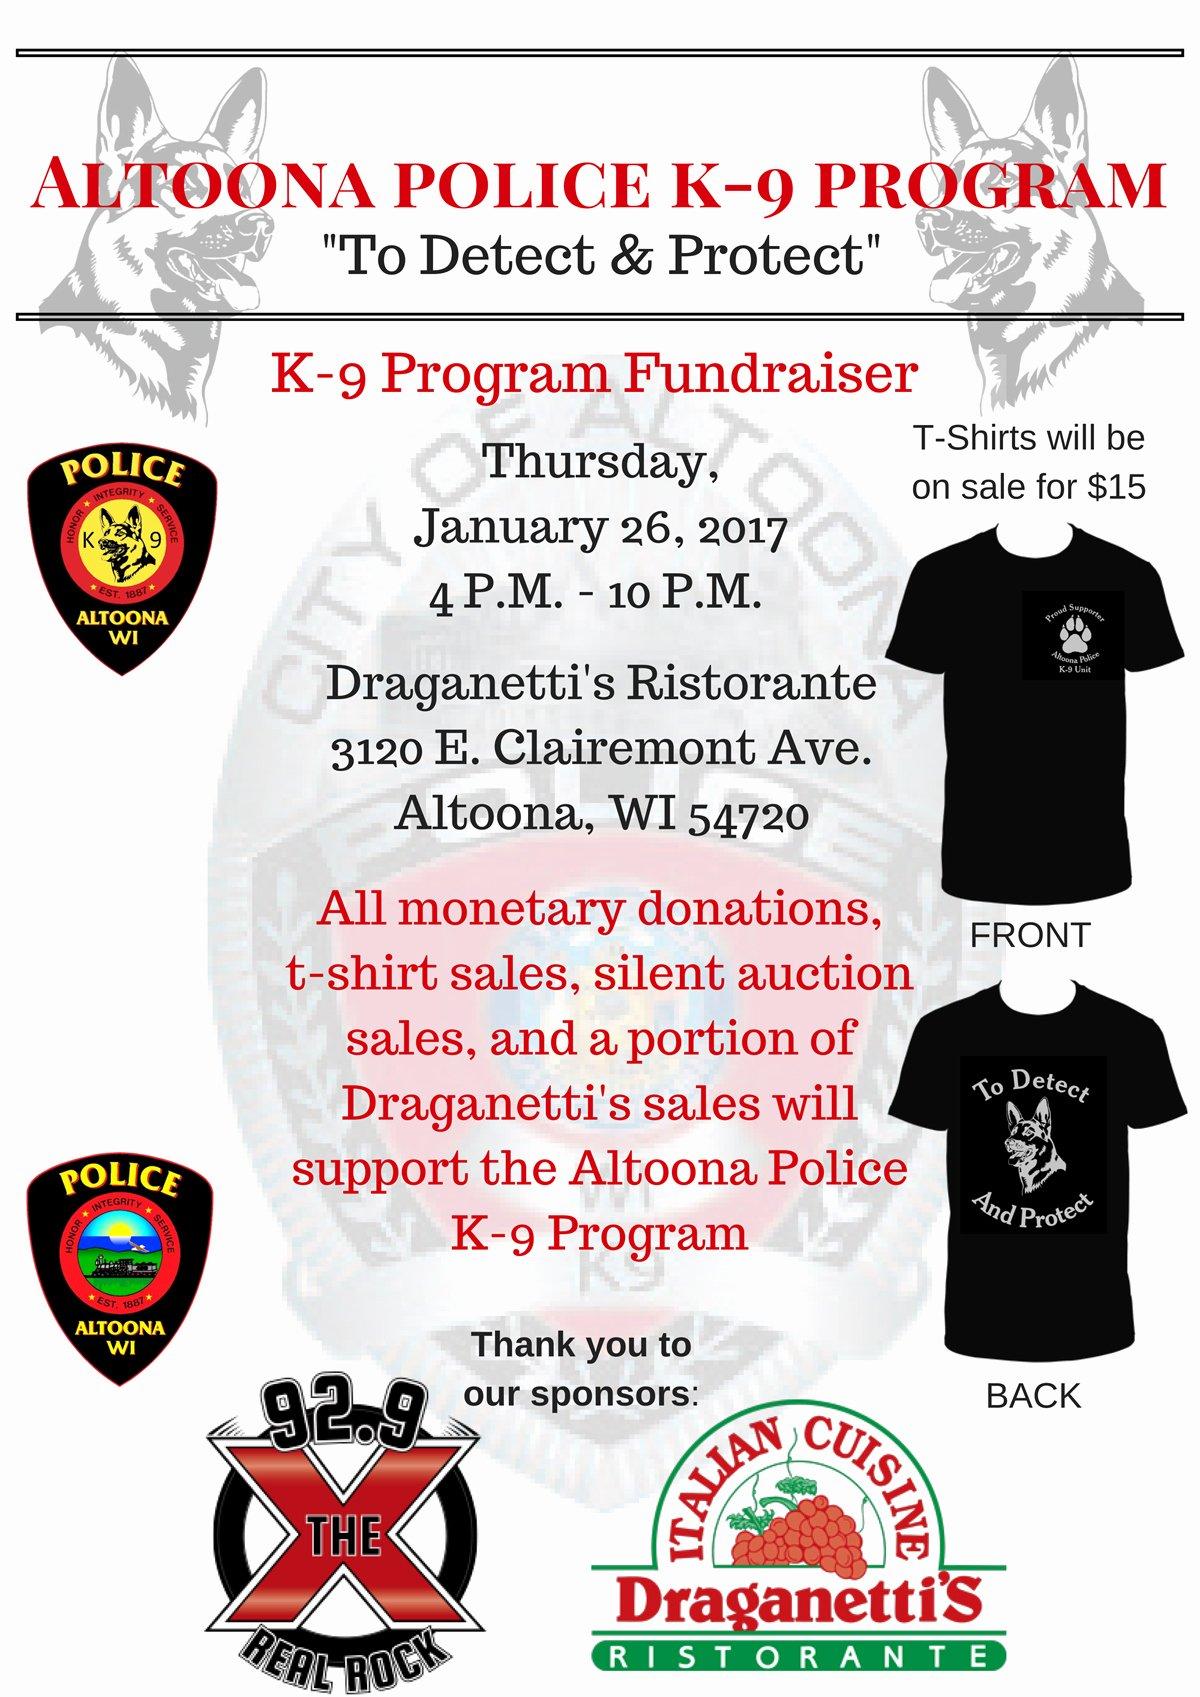 T Shirt Fundraiser Flyer Awesome Altoona K 9 Fundraiser